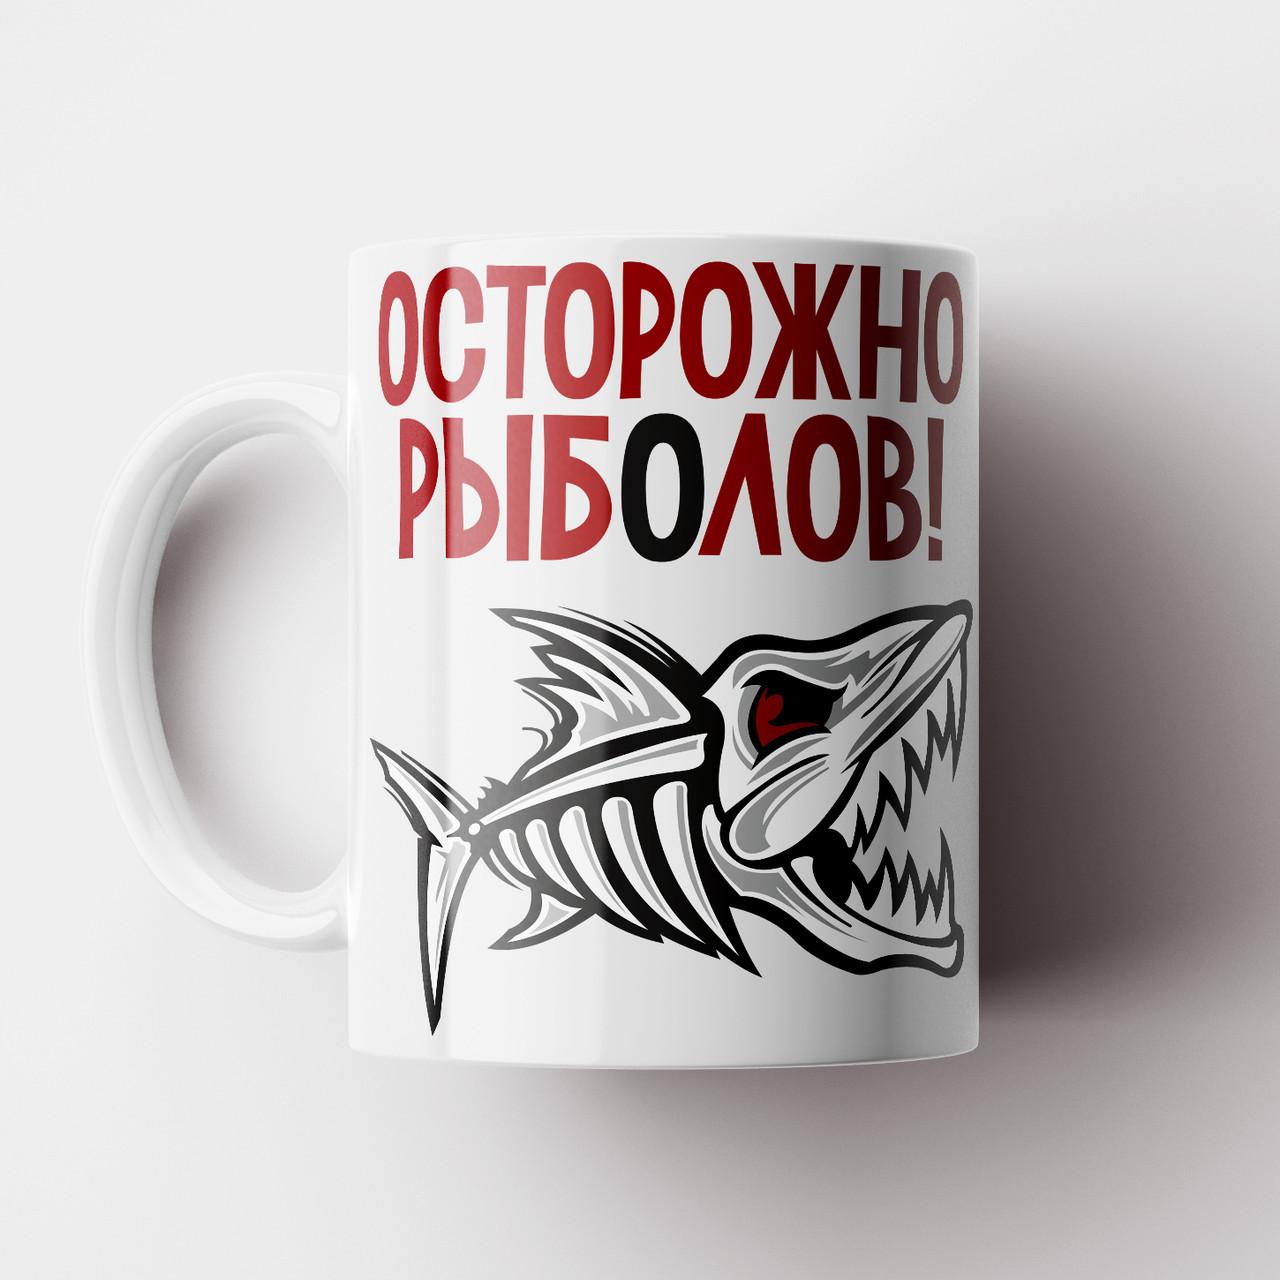 Чашка подарунок Рибаку v4. Чашка з принтом